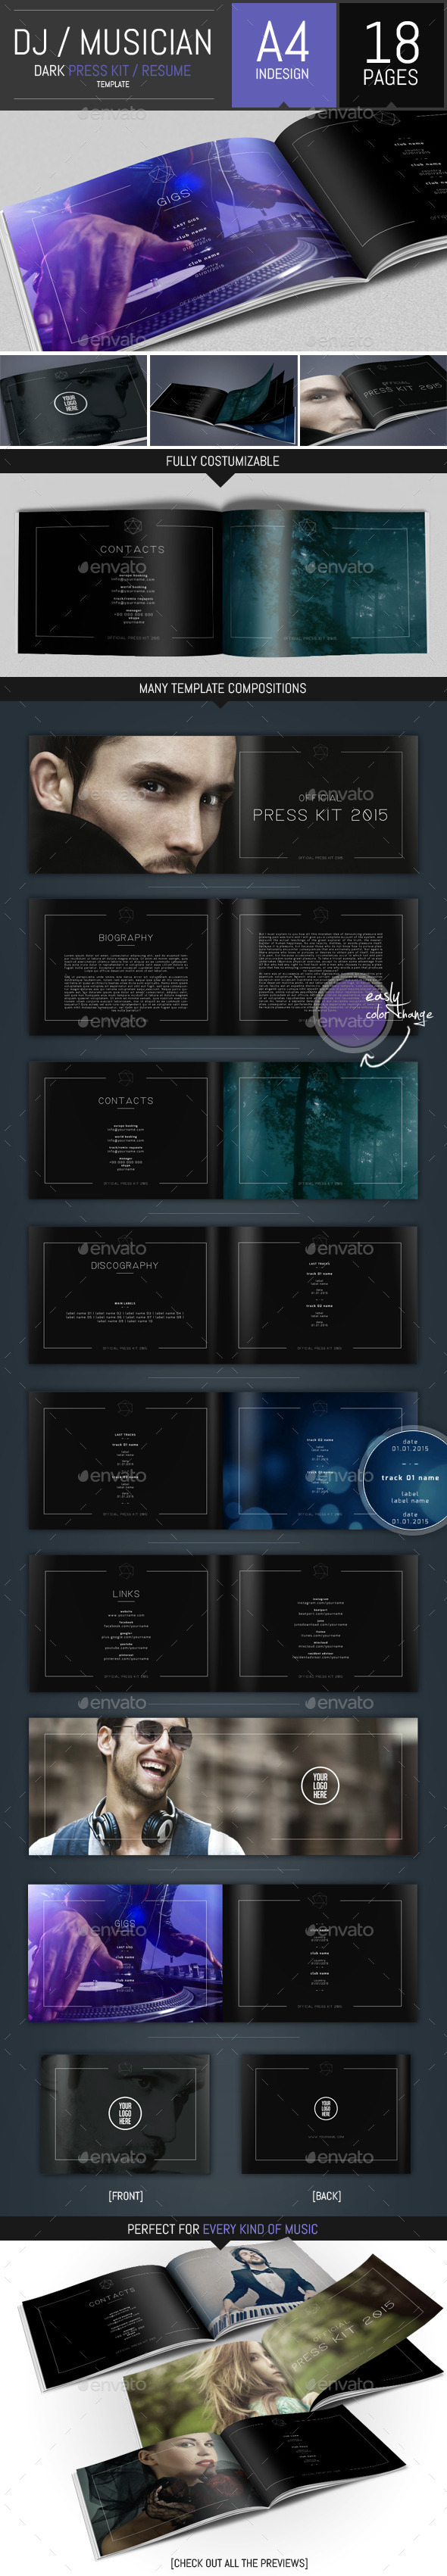 GraphicRiver Dj and Musician Dark Press Kit Resume Template 10022884